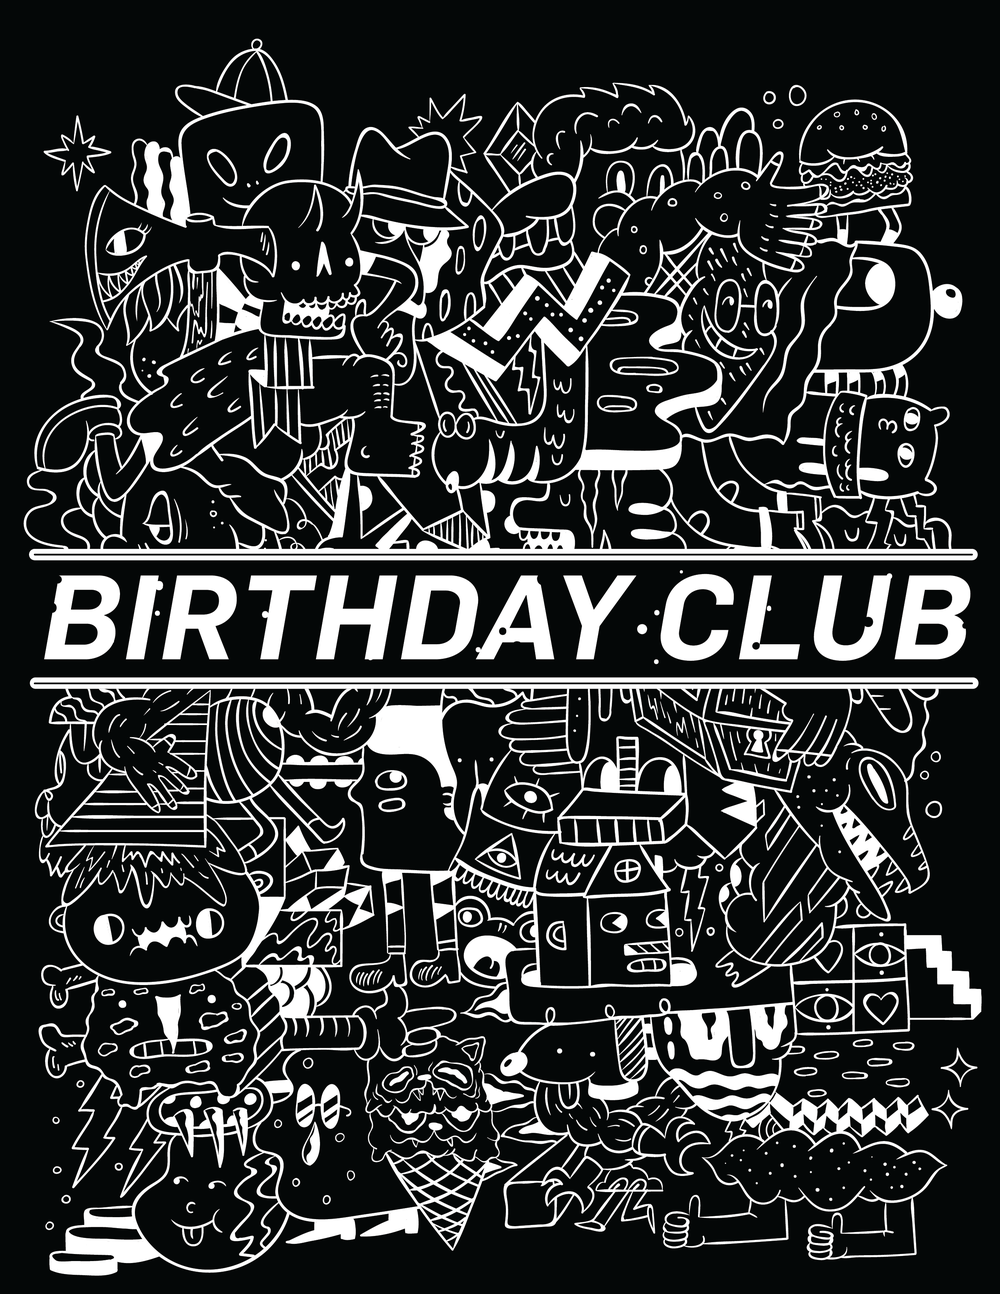 BIRTHDAYCLUBshirt-01.png